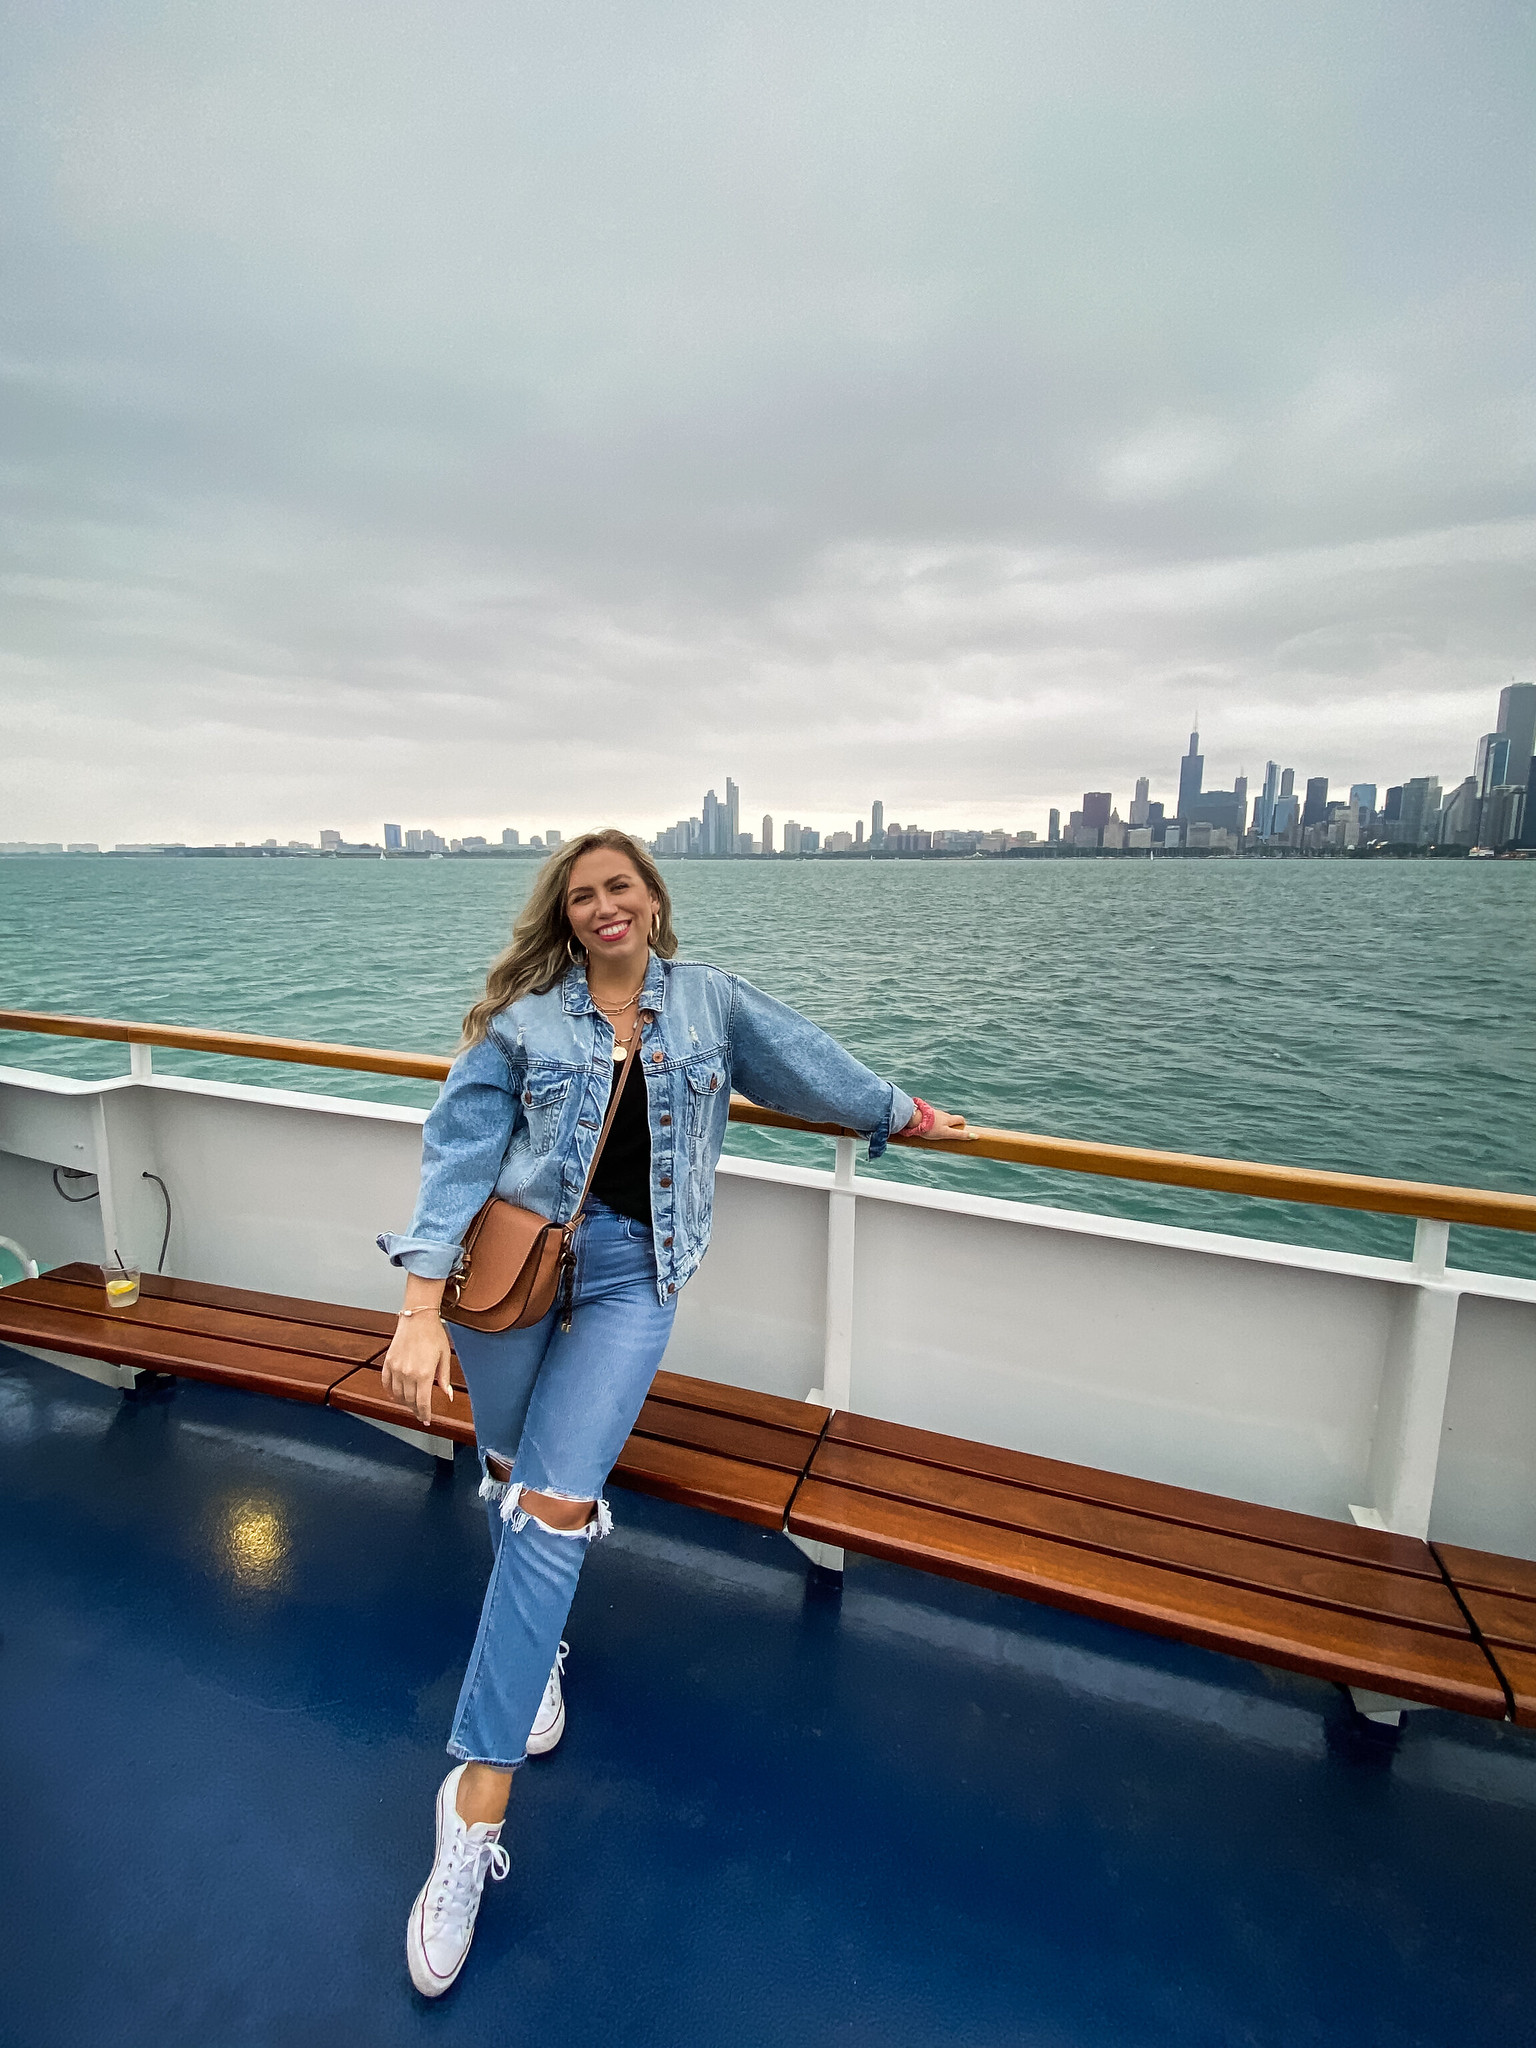 Wendella Boat Rides Chicago Architecture Tour